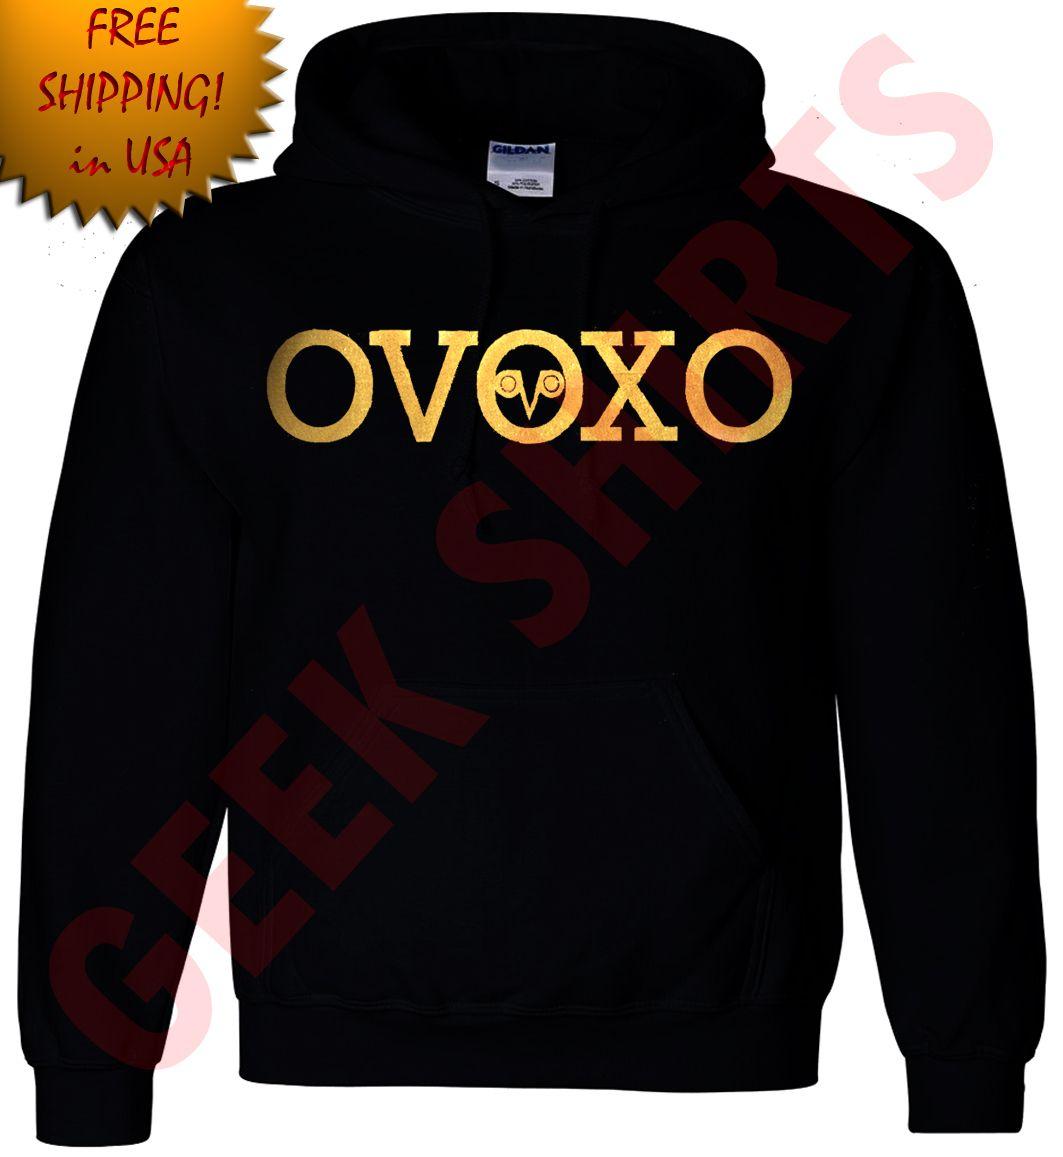 c2a129c1c3abd GOLD OVO Drake Take Care Hoodie OVOxo owl YMCMB hooded sweat shirt YL-5X  hoody 1